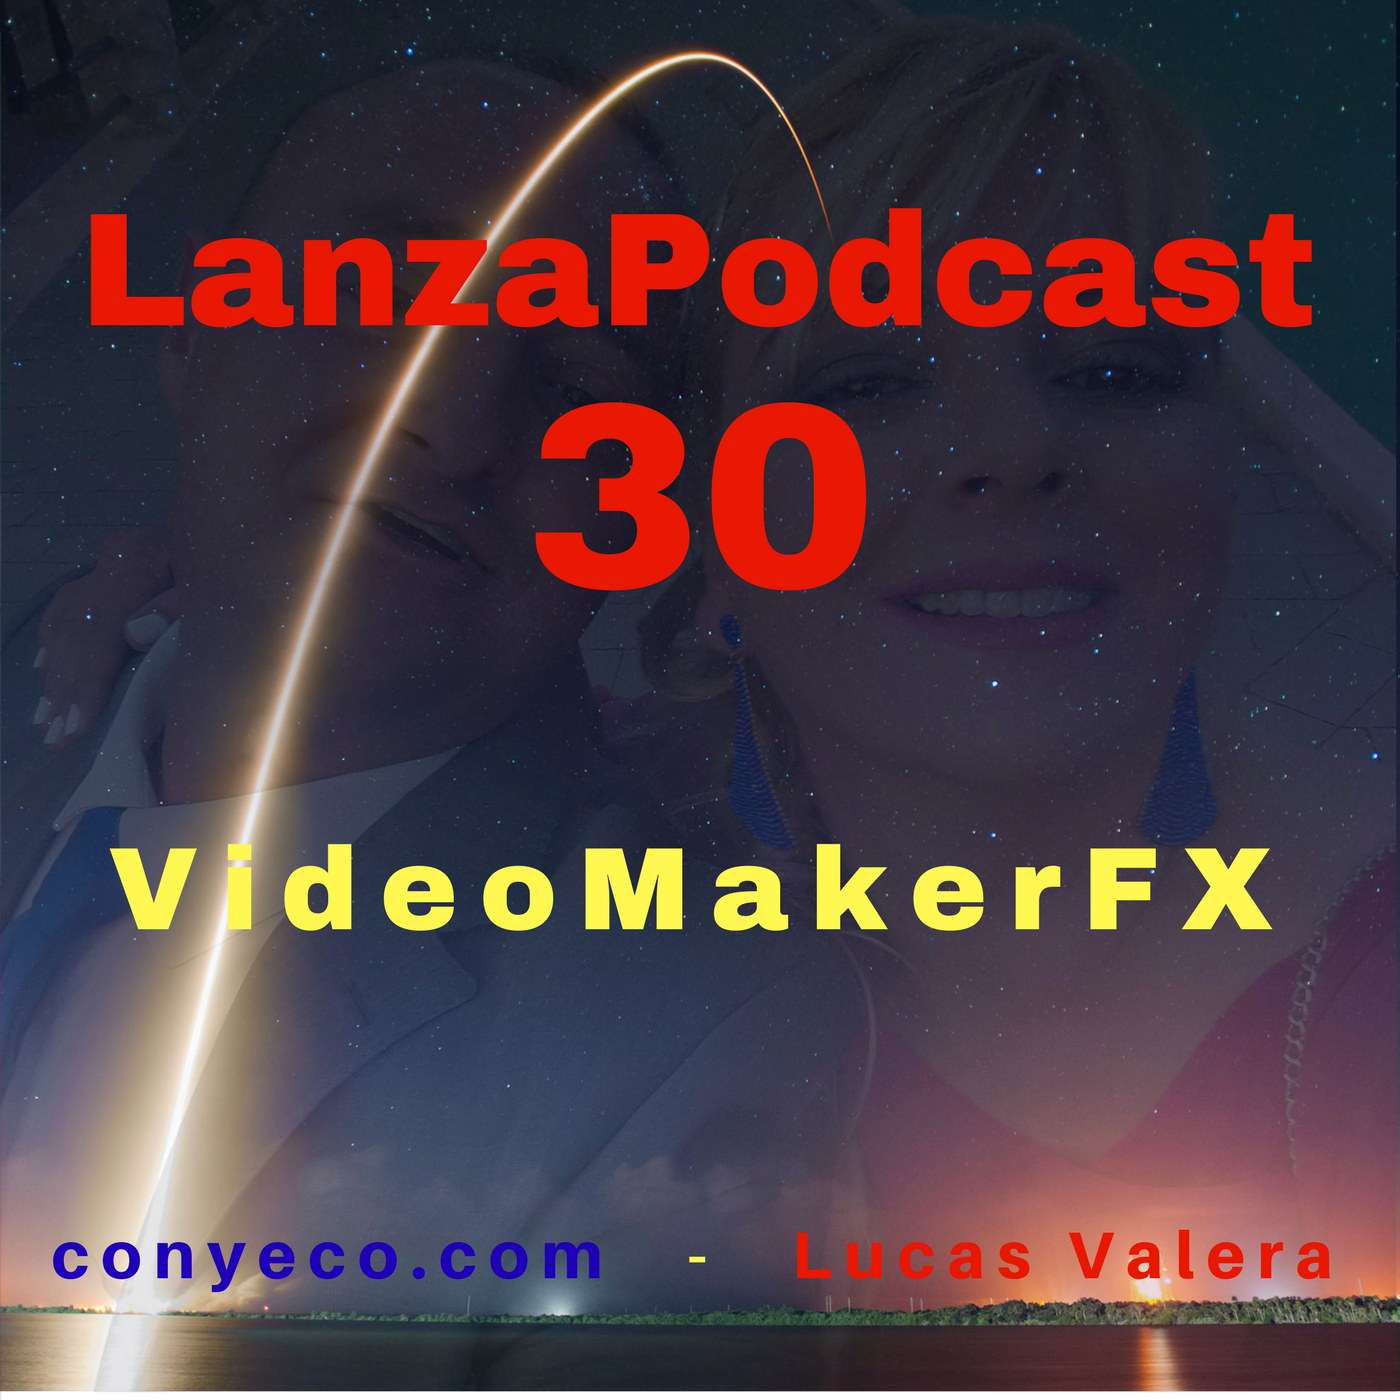 videomakerfx-review-bonuses/